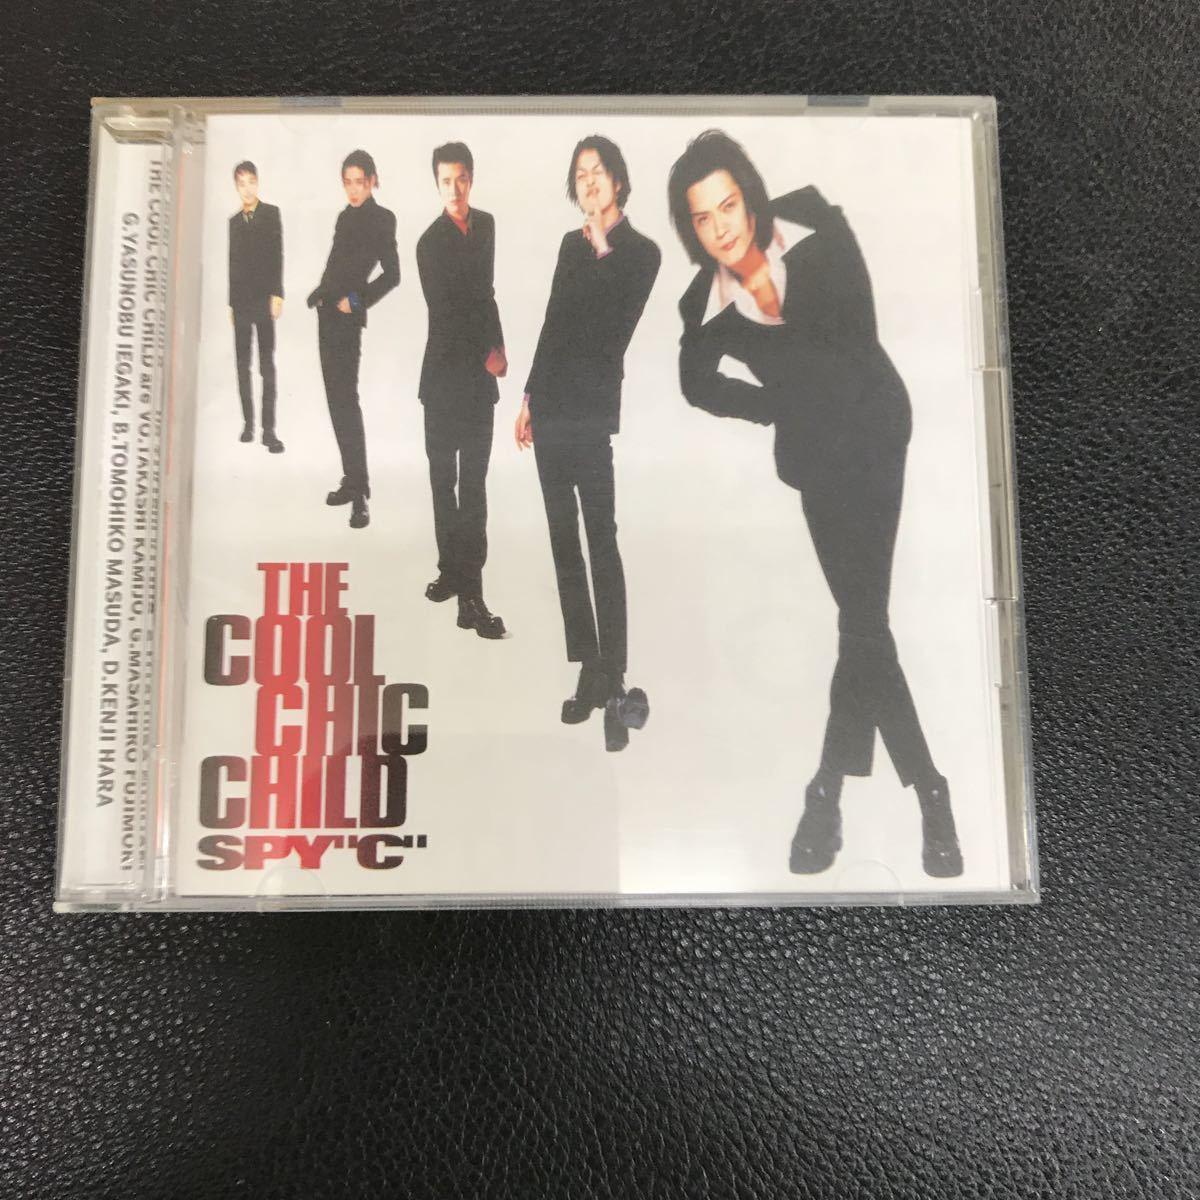 CD 中古☆【邦楽】THE COOL CHIC CHILD SPY'C'